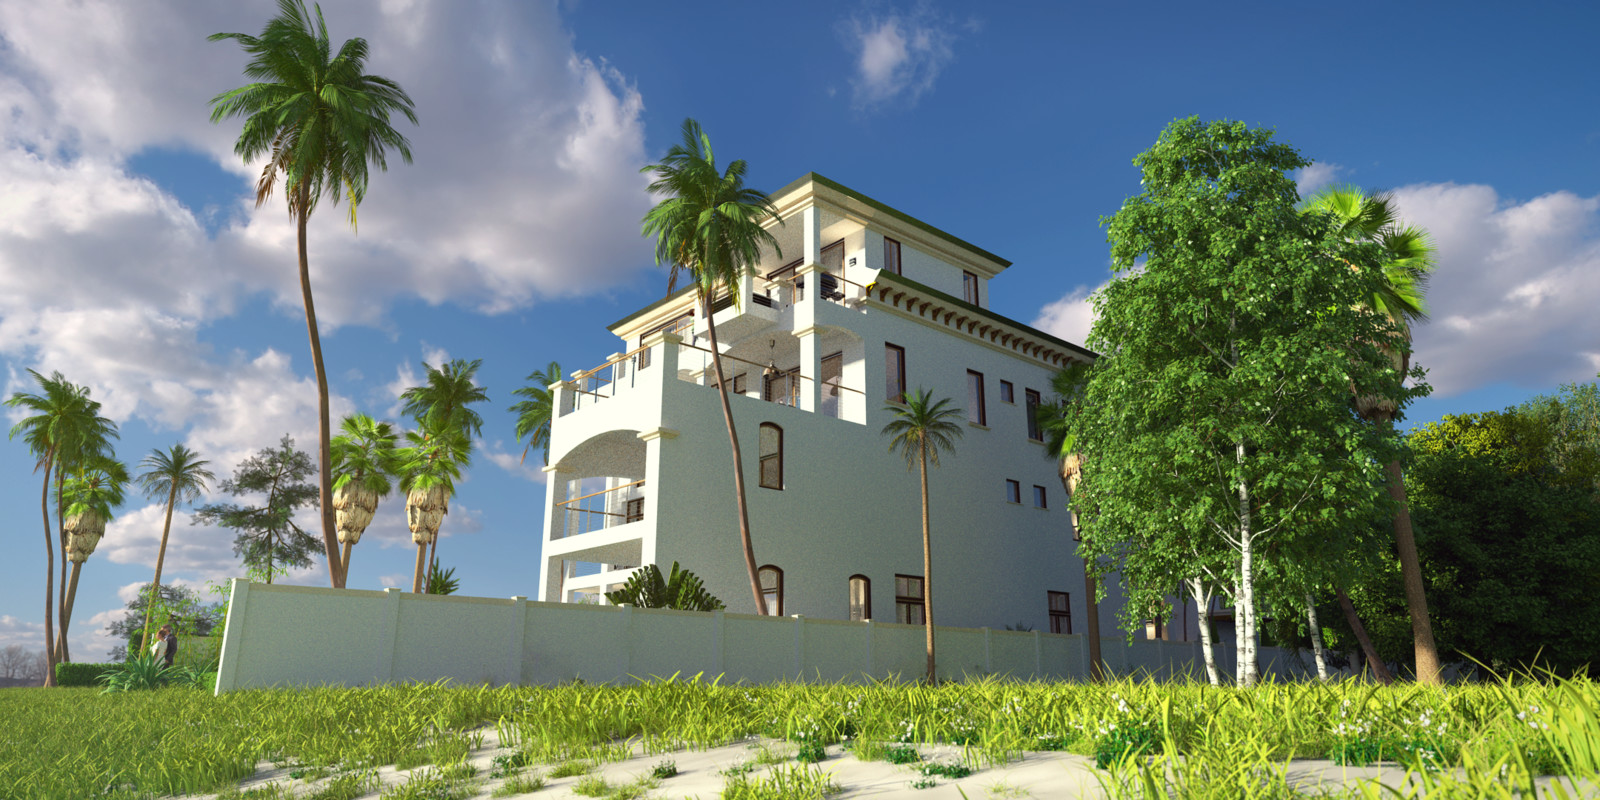 SketchUp + Thea Render  Seagrove Beach House: Scene 3 B Lumina Early 2160 × 1080 Presto MC Bucket  HDR used (HQ version) by HDRI-SKIES http://hdri-skies.com/shop/hdri-sky-162/